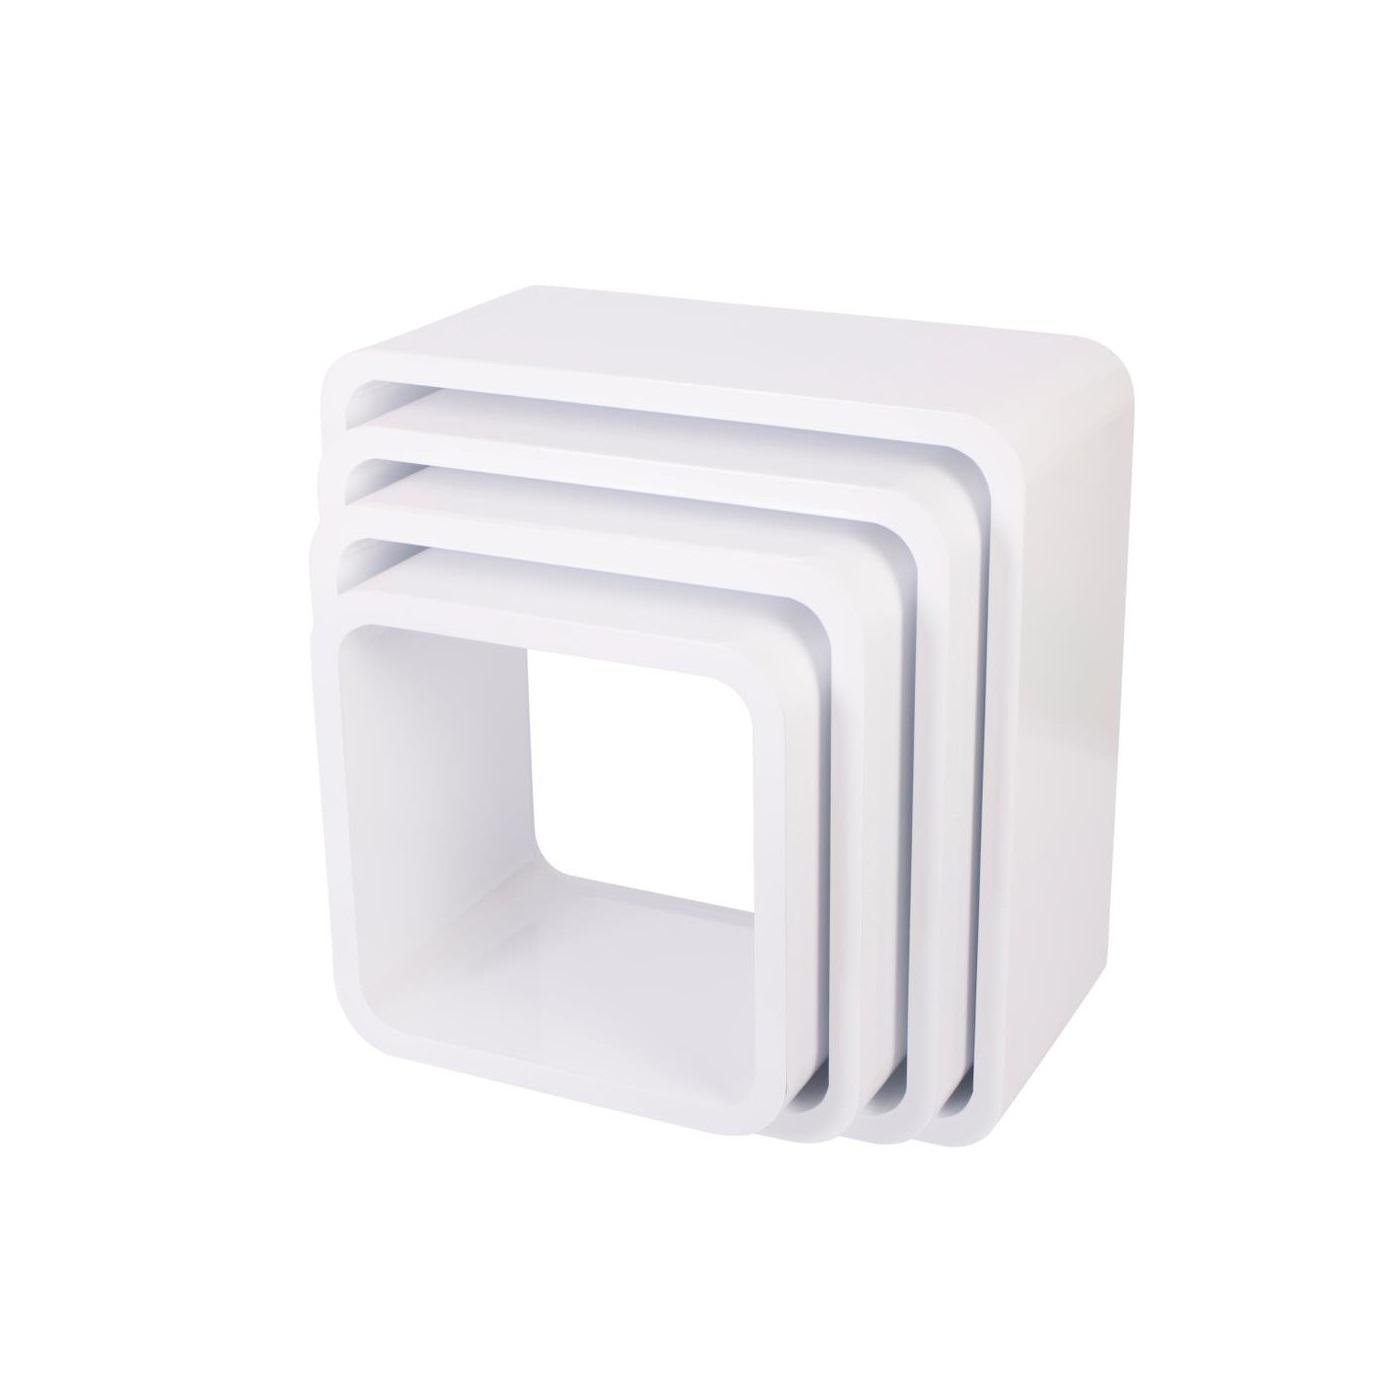 Bokhyllor kvadrat 4 st vit, Sebra Interiör